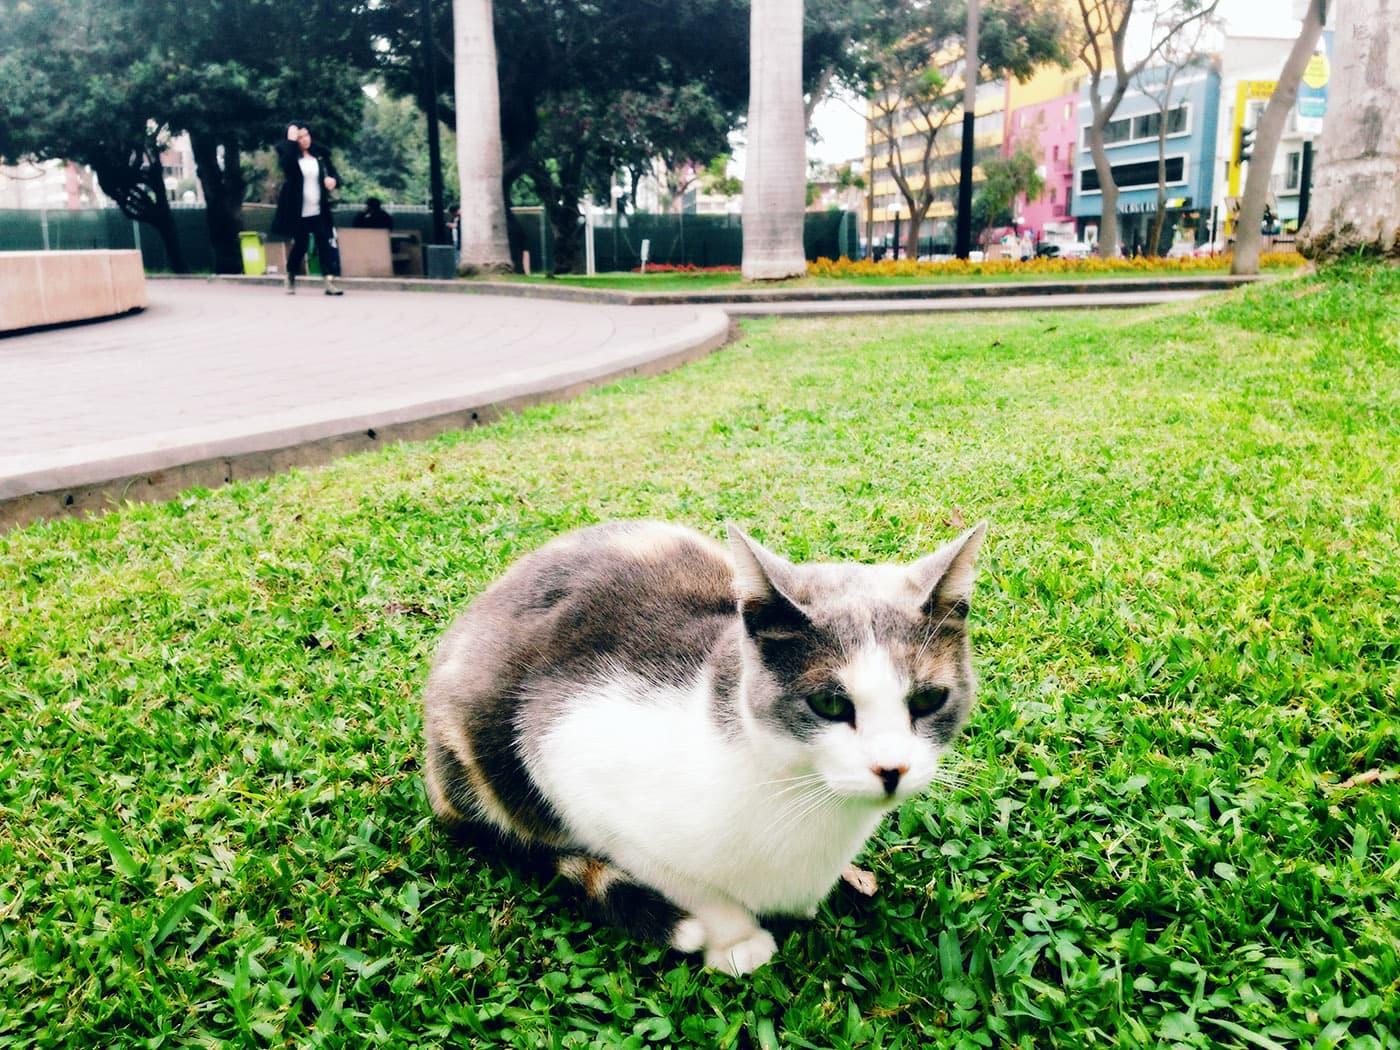 Cats in Parque Central de Miraflores in Lima, Peru